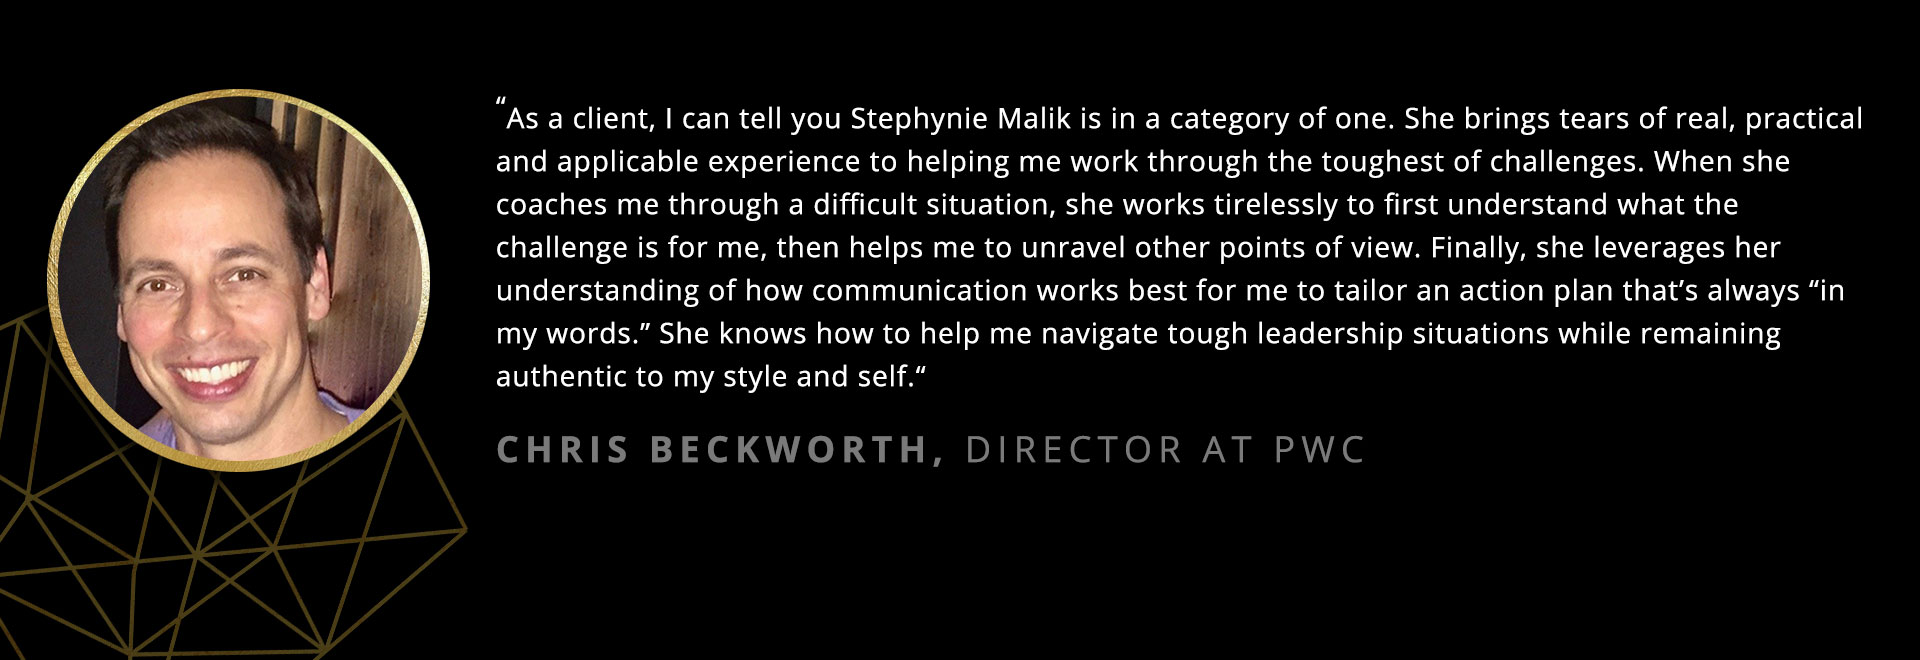 Testimonial_Beckworth.jpg